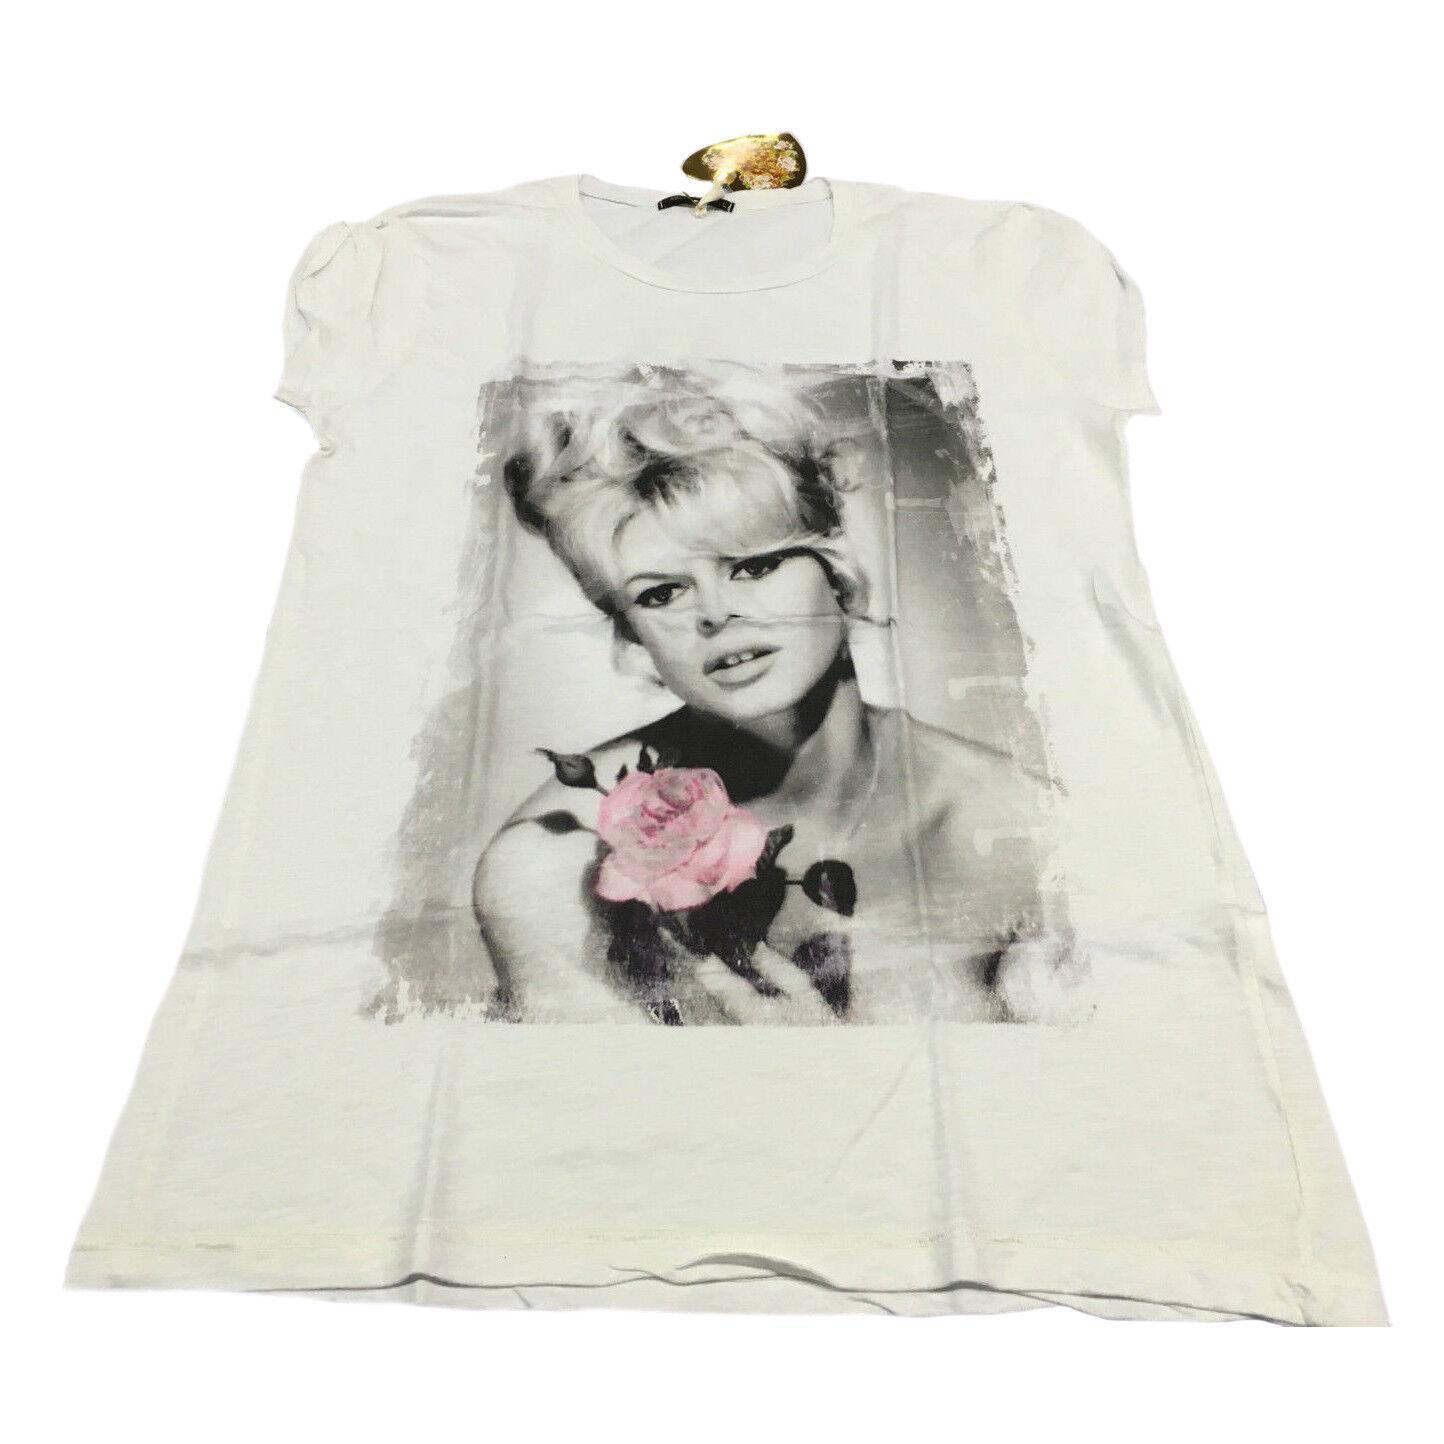 Romeo & Julieta Women's T-Shirt White Mod. Brigitte 100% Cotton Made in